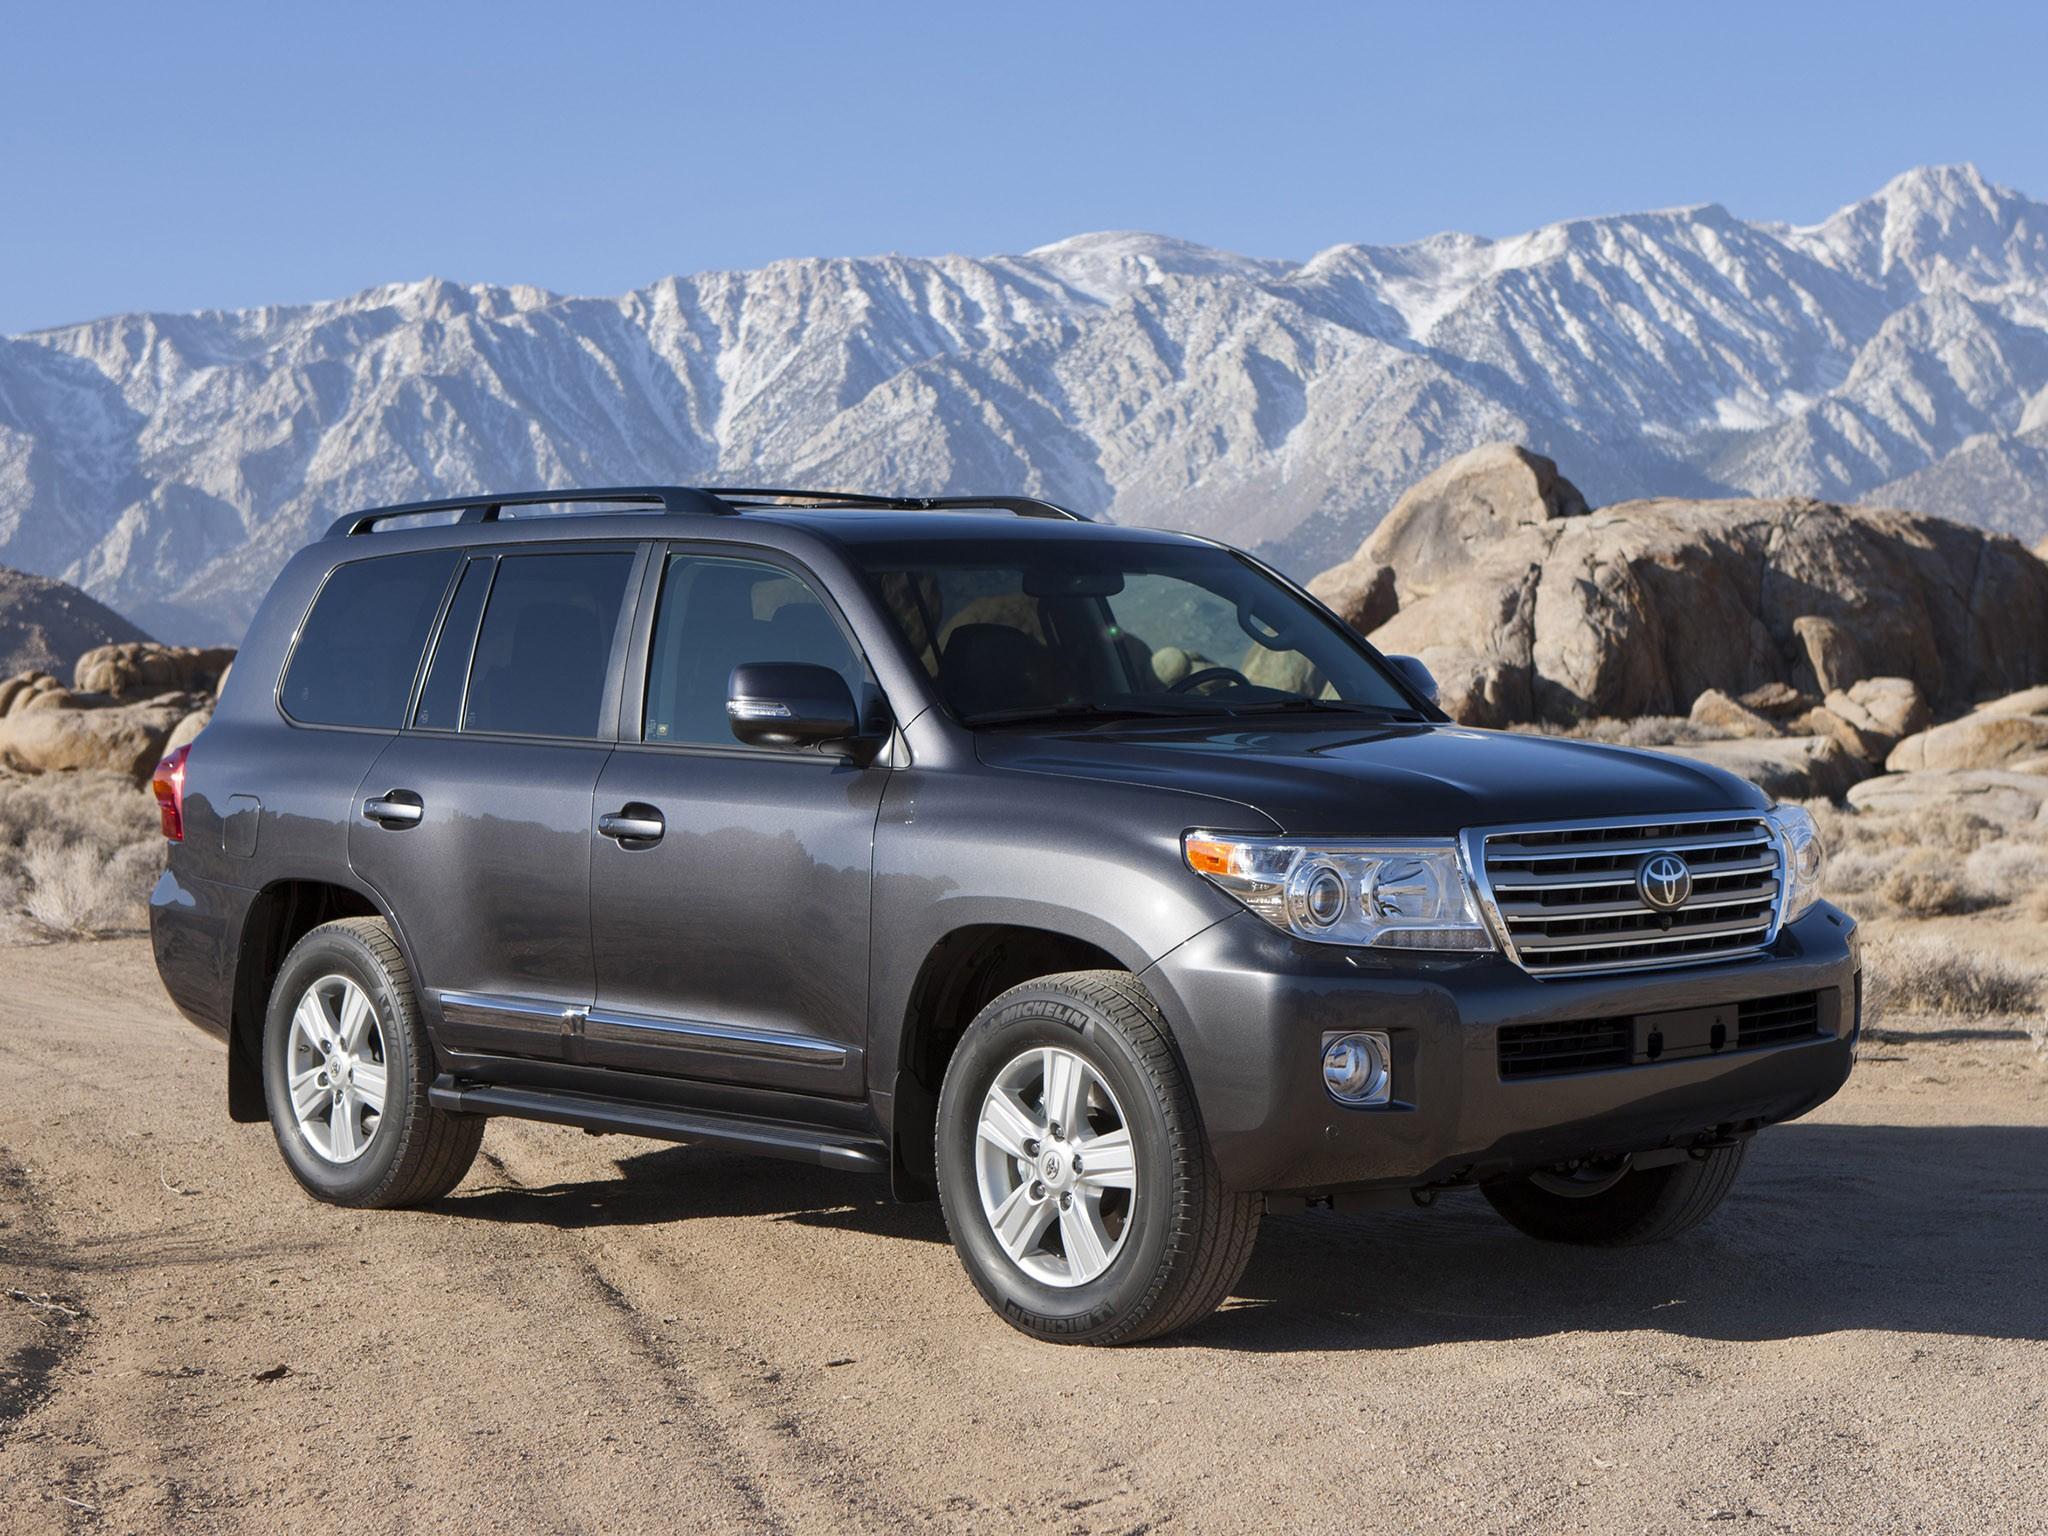 2012 Toyota Land Cruiser USA